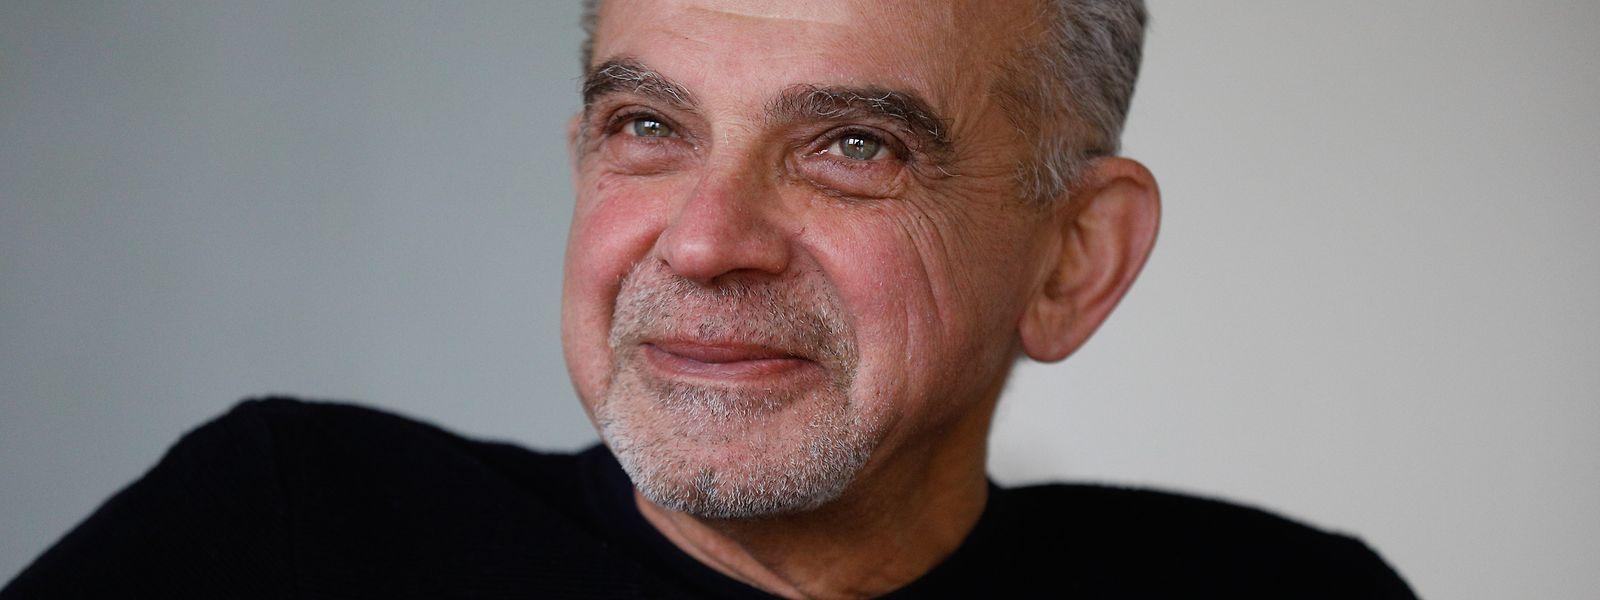 Fari Khabirpour ist Psychologe und Psychotherapeut.